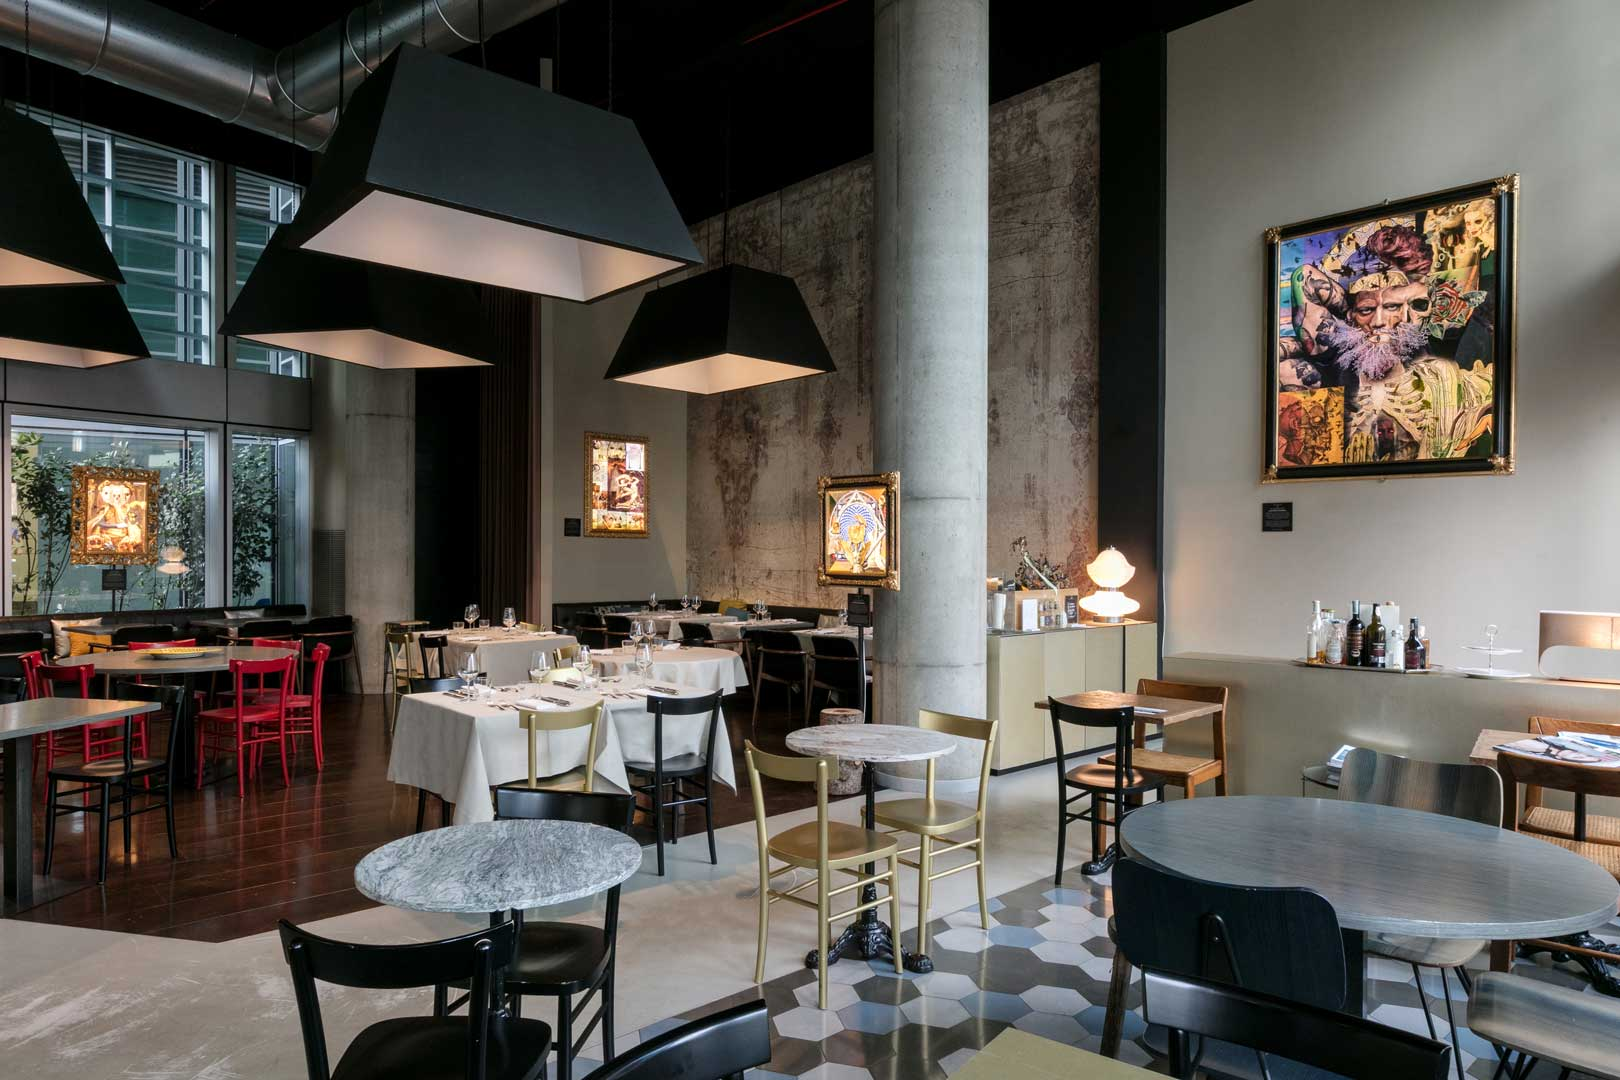 10 ristoranti industrial chic - Il Santa